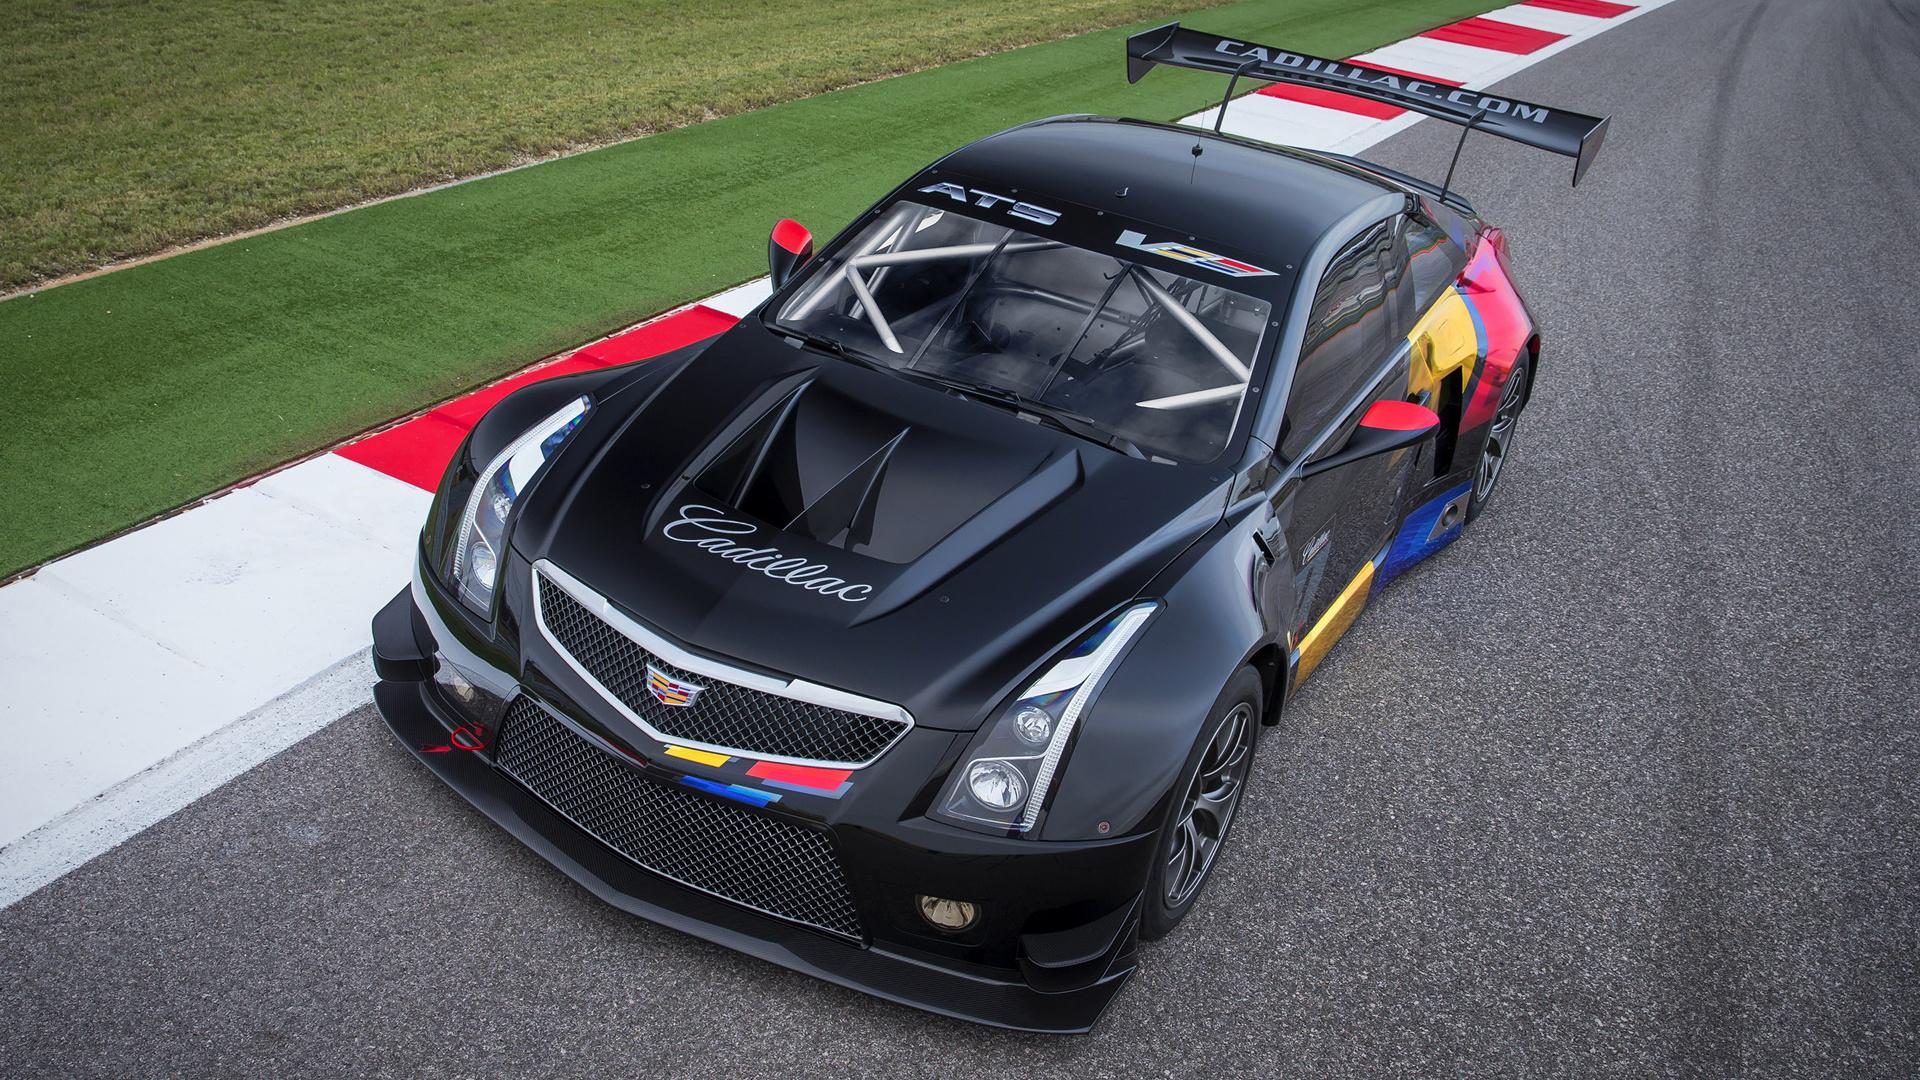 Cadillac ATS-V.R (2015) Wallpapers and HD Images - Car Pixel